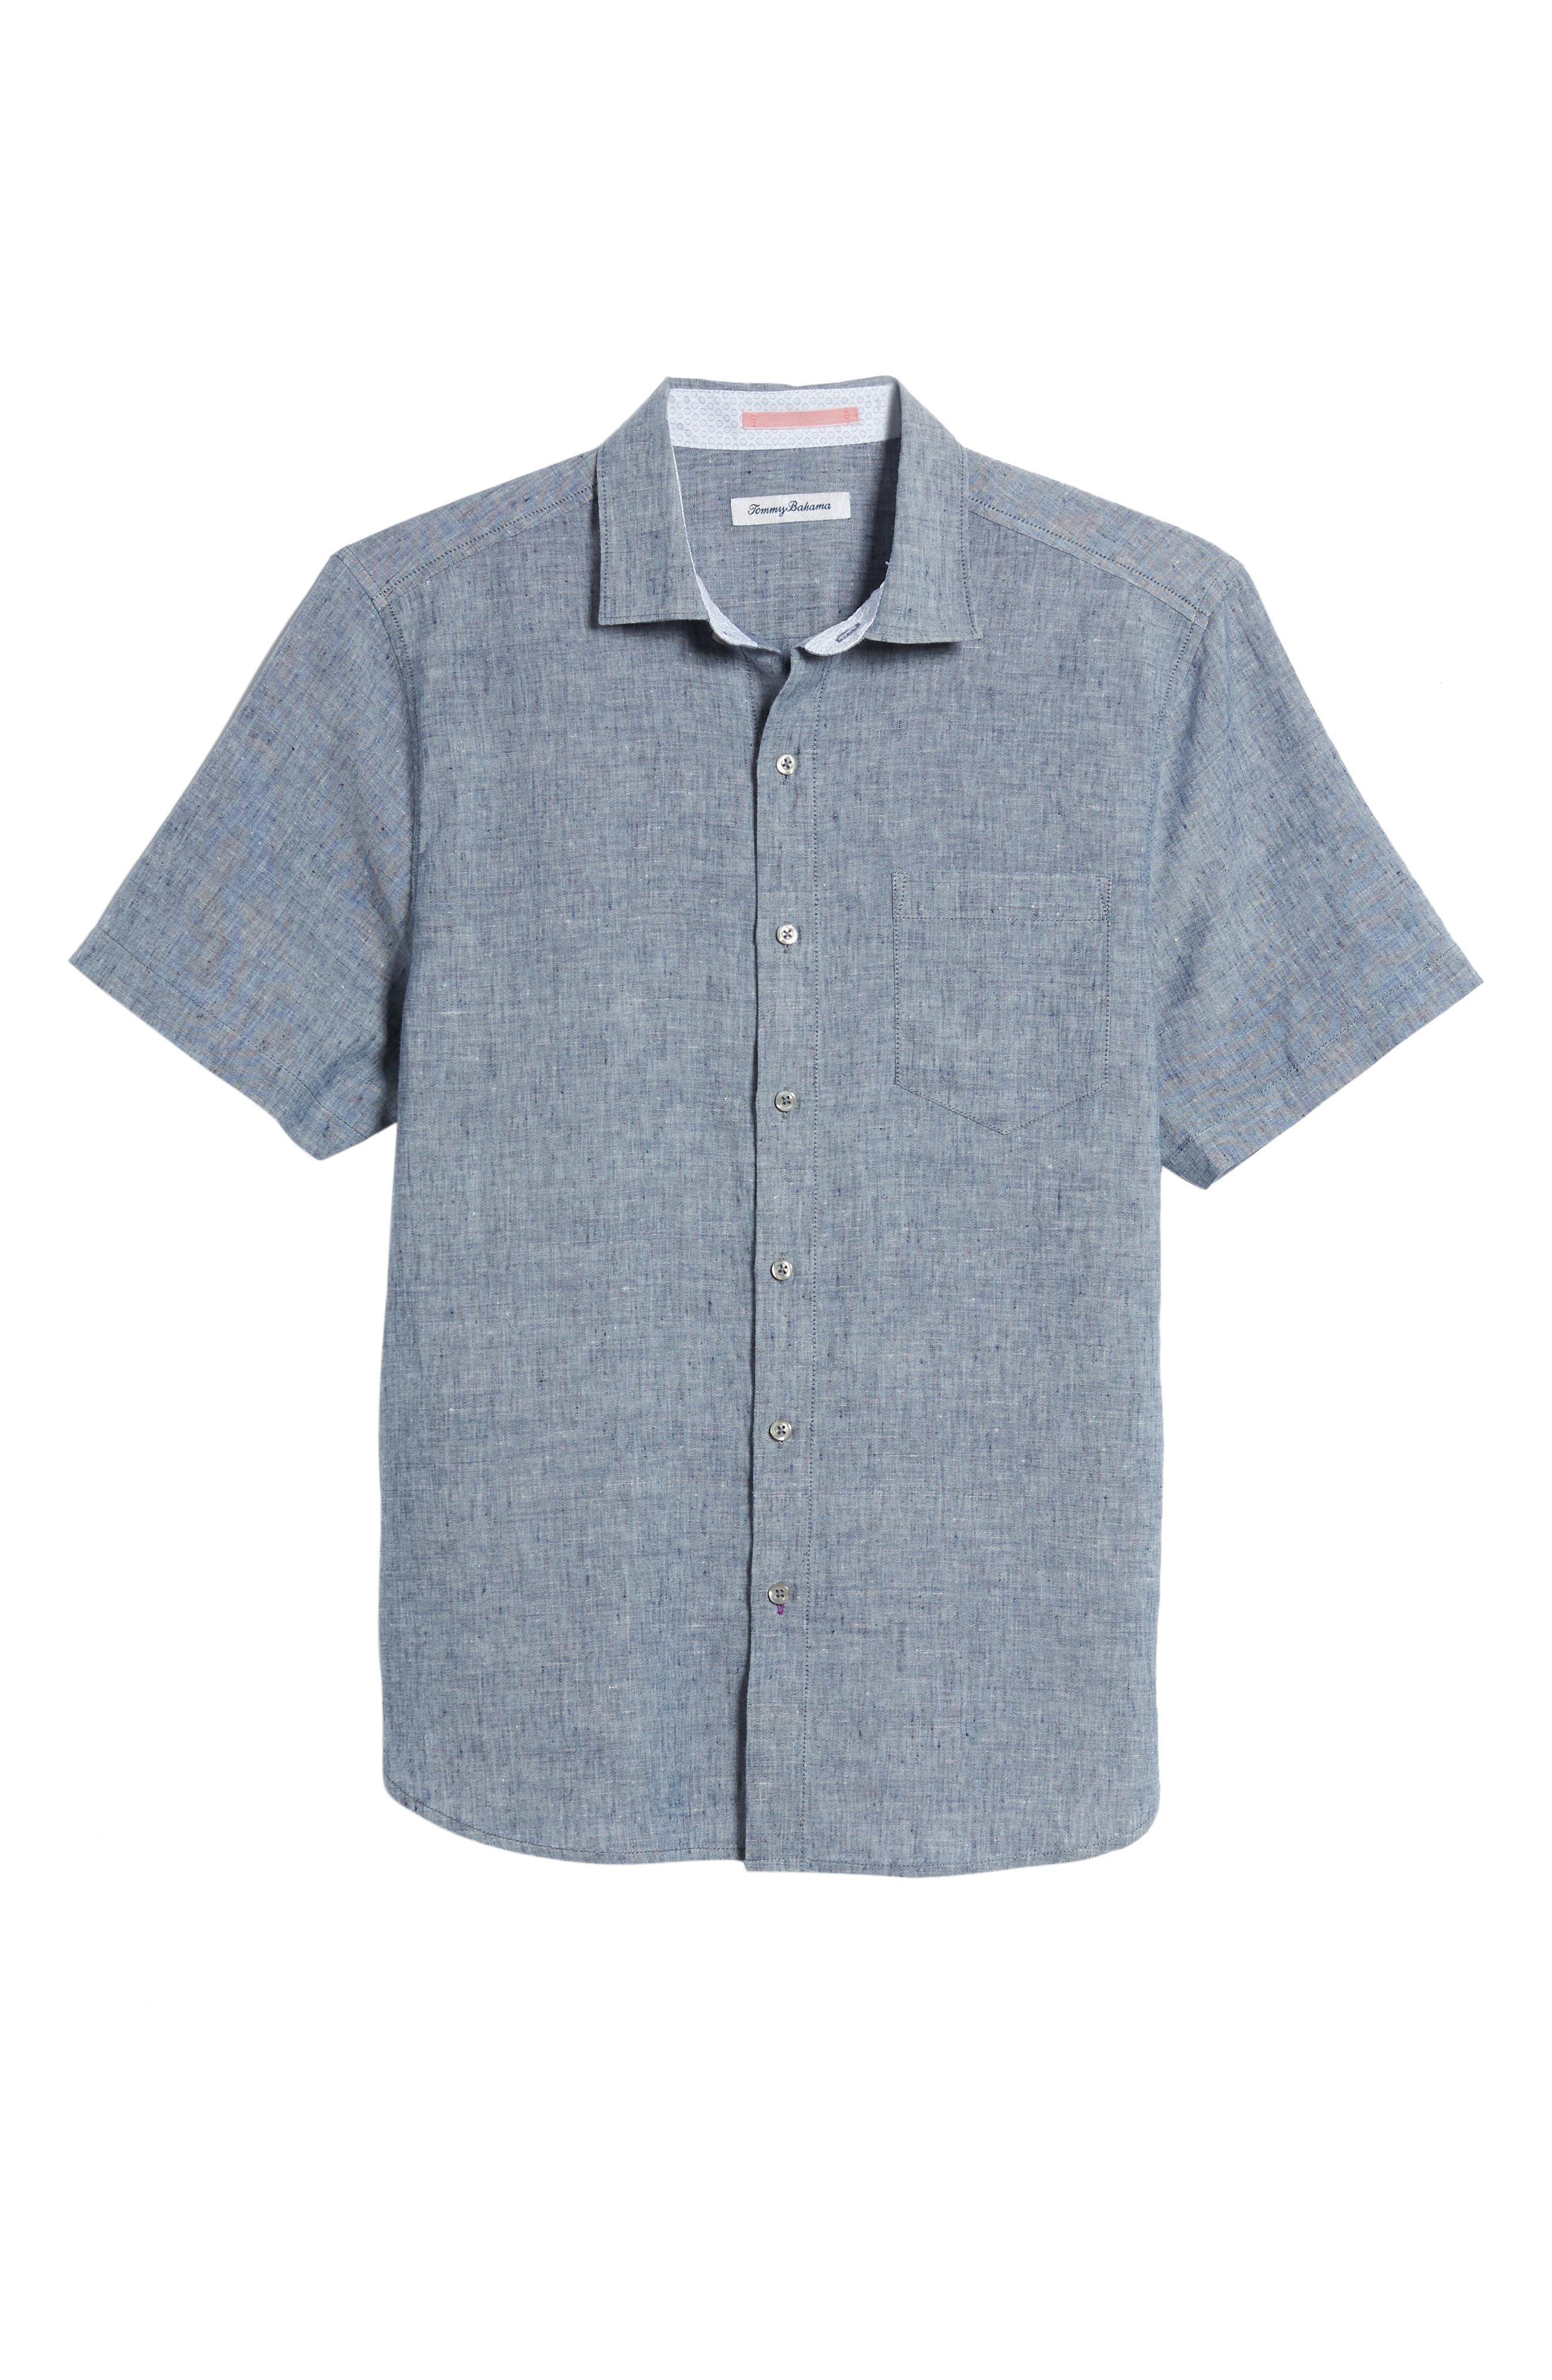 Lanai Tides Linen Blend Sport Shirt,                             Alternate thumbnail 6, color,                             THRONE BLUE